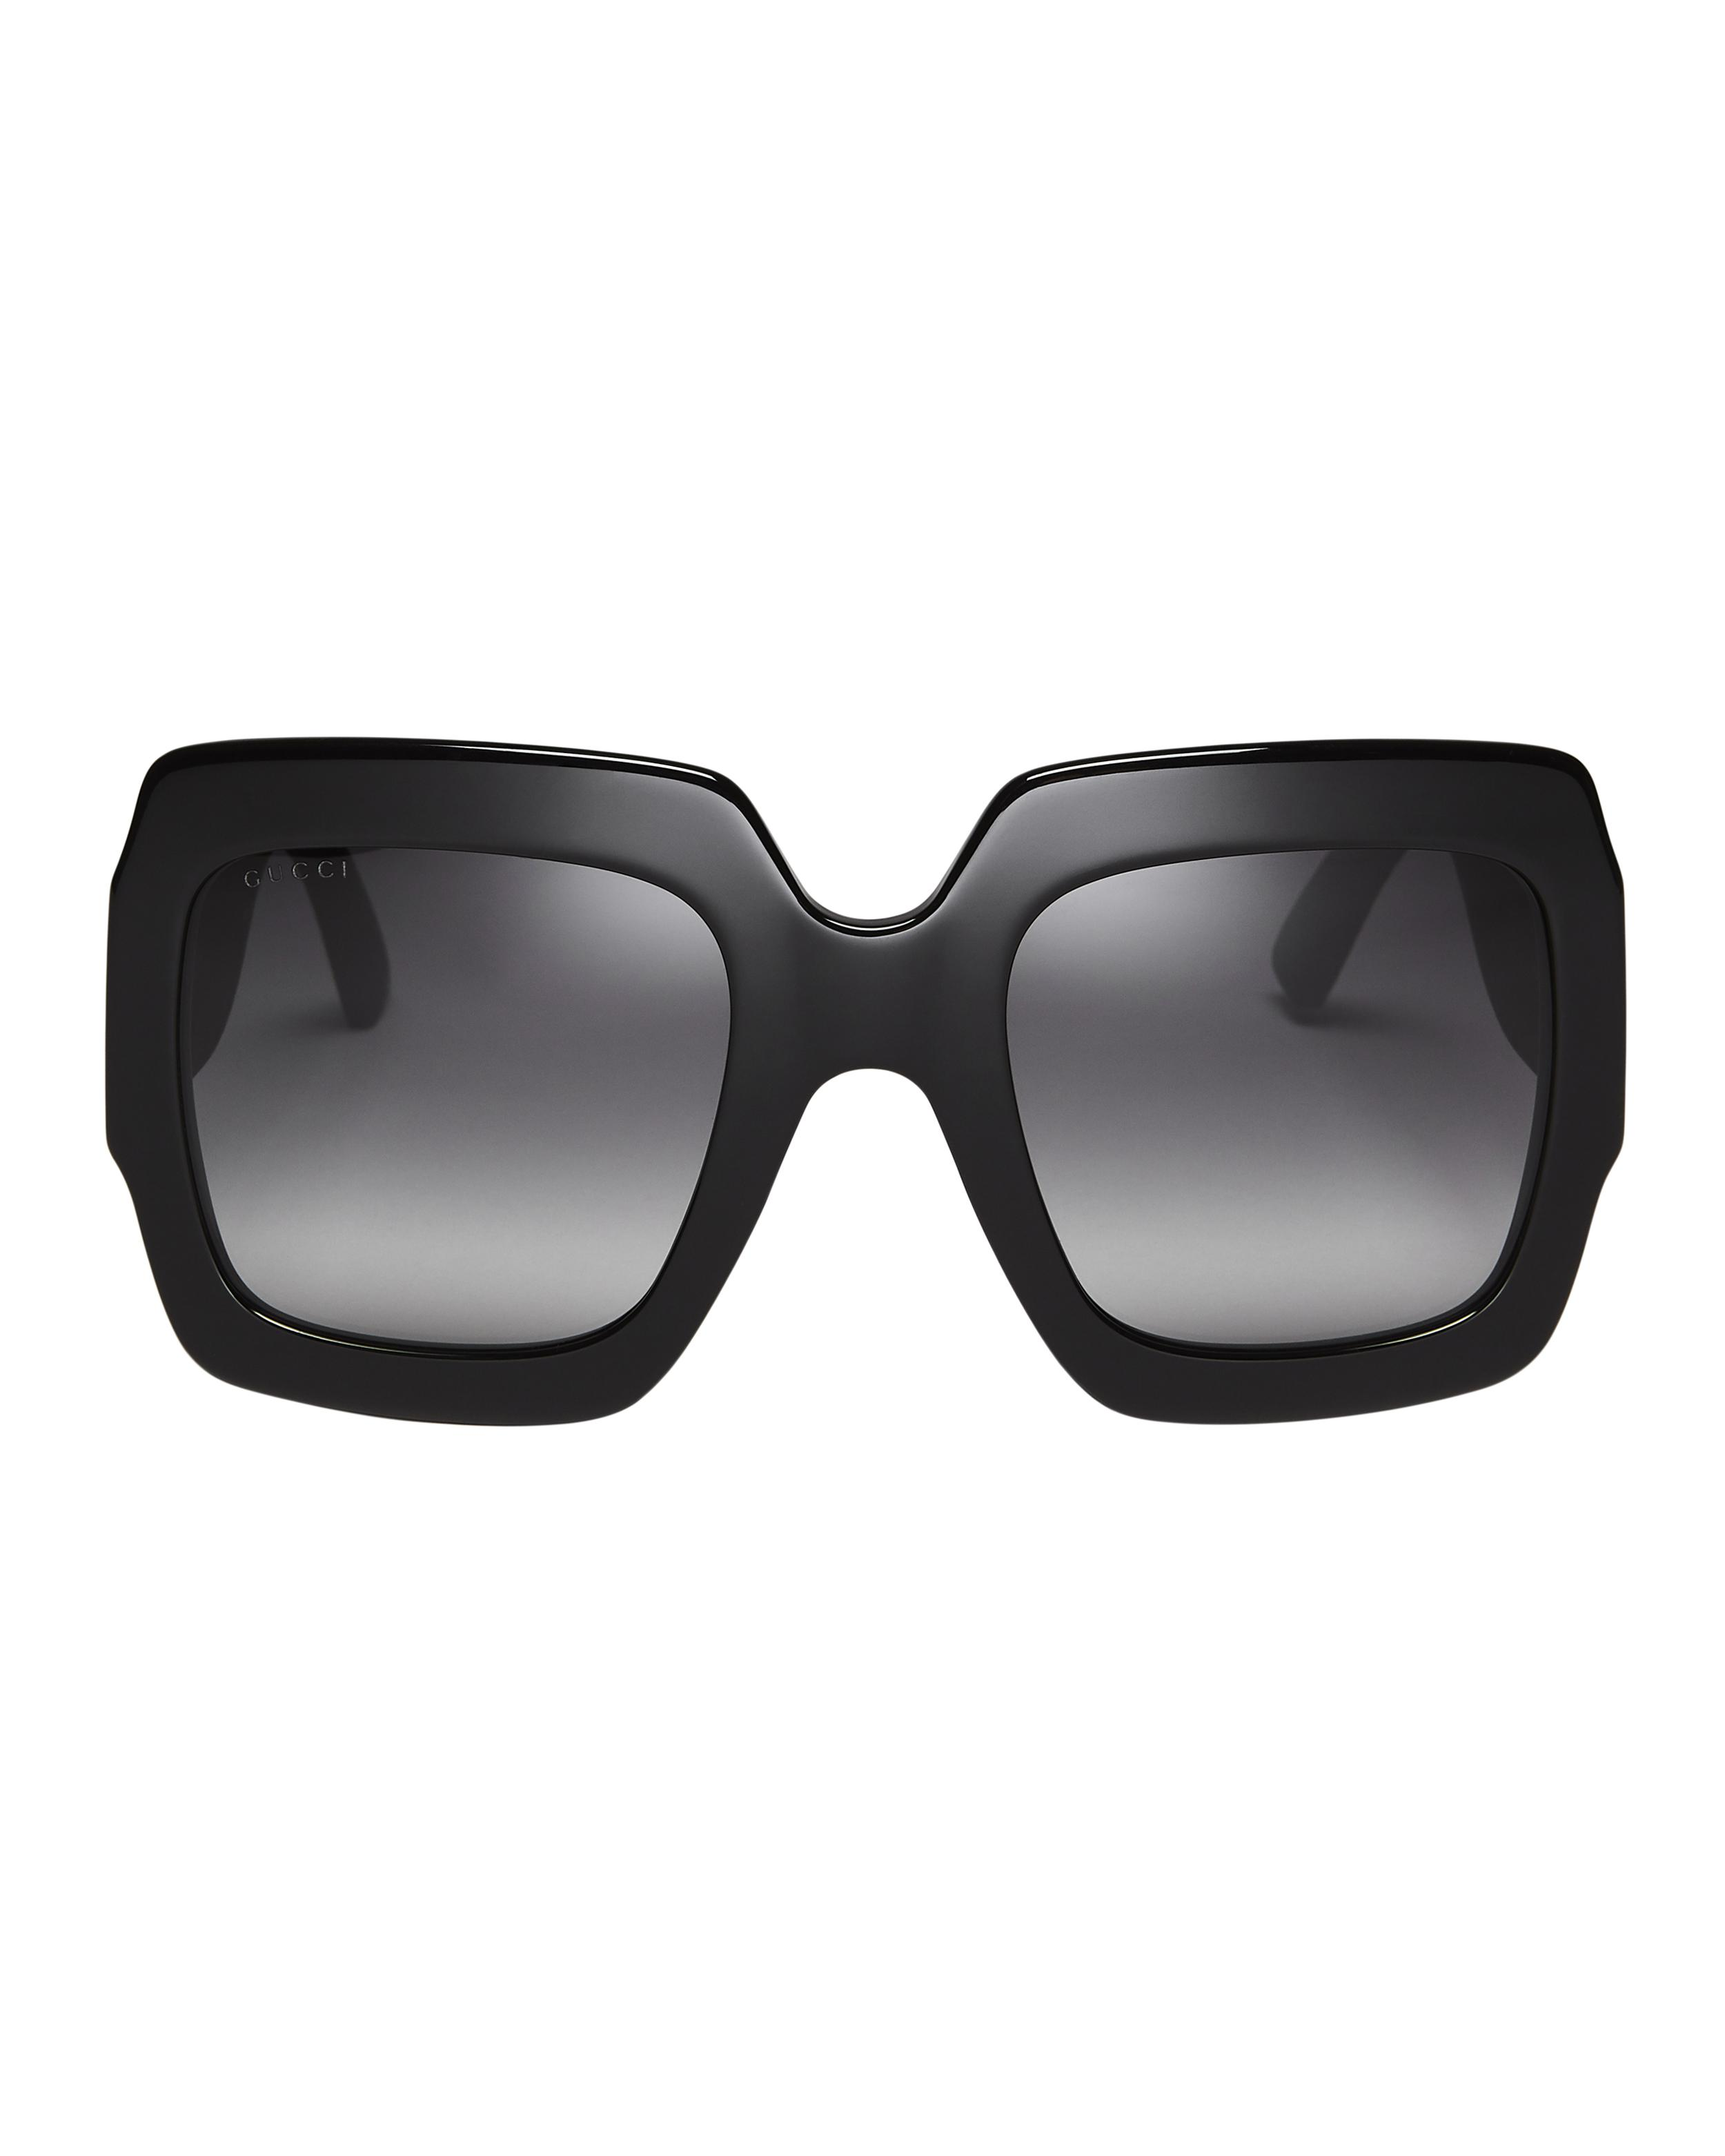 58f1be0079 Gucci - Black Oversized Glitter Square Sunglasses - Lyst. View fullscreen